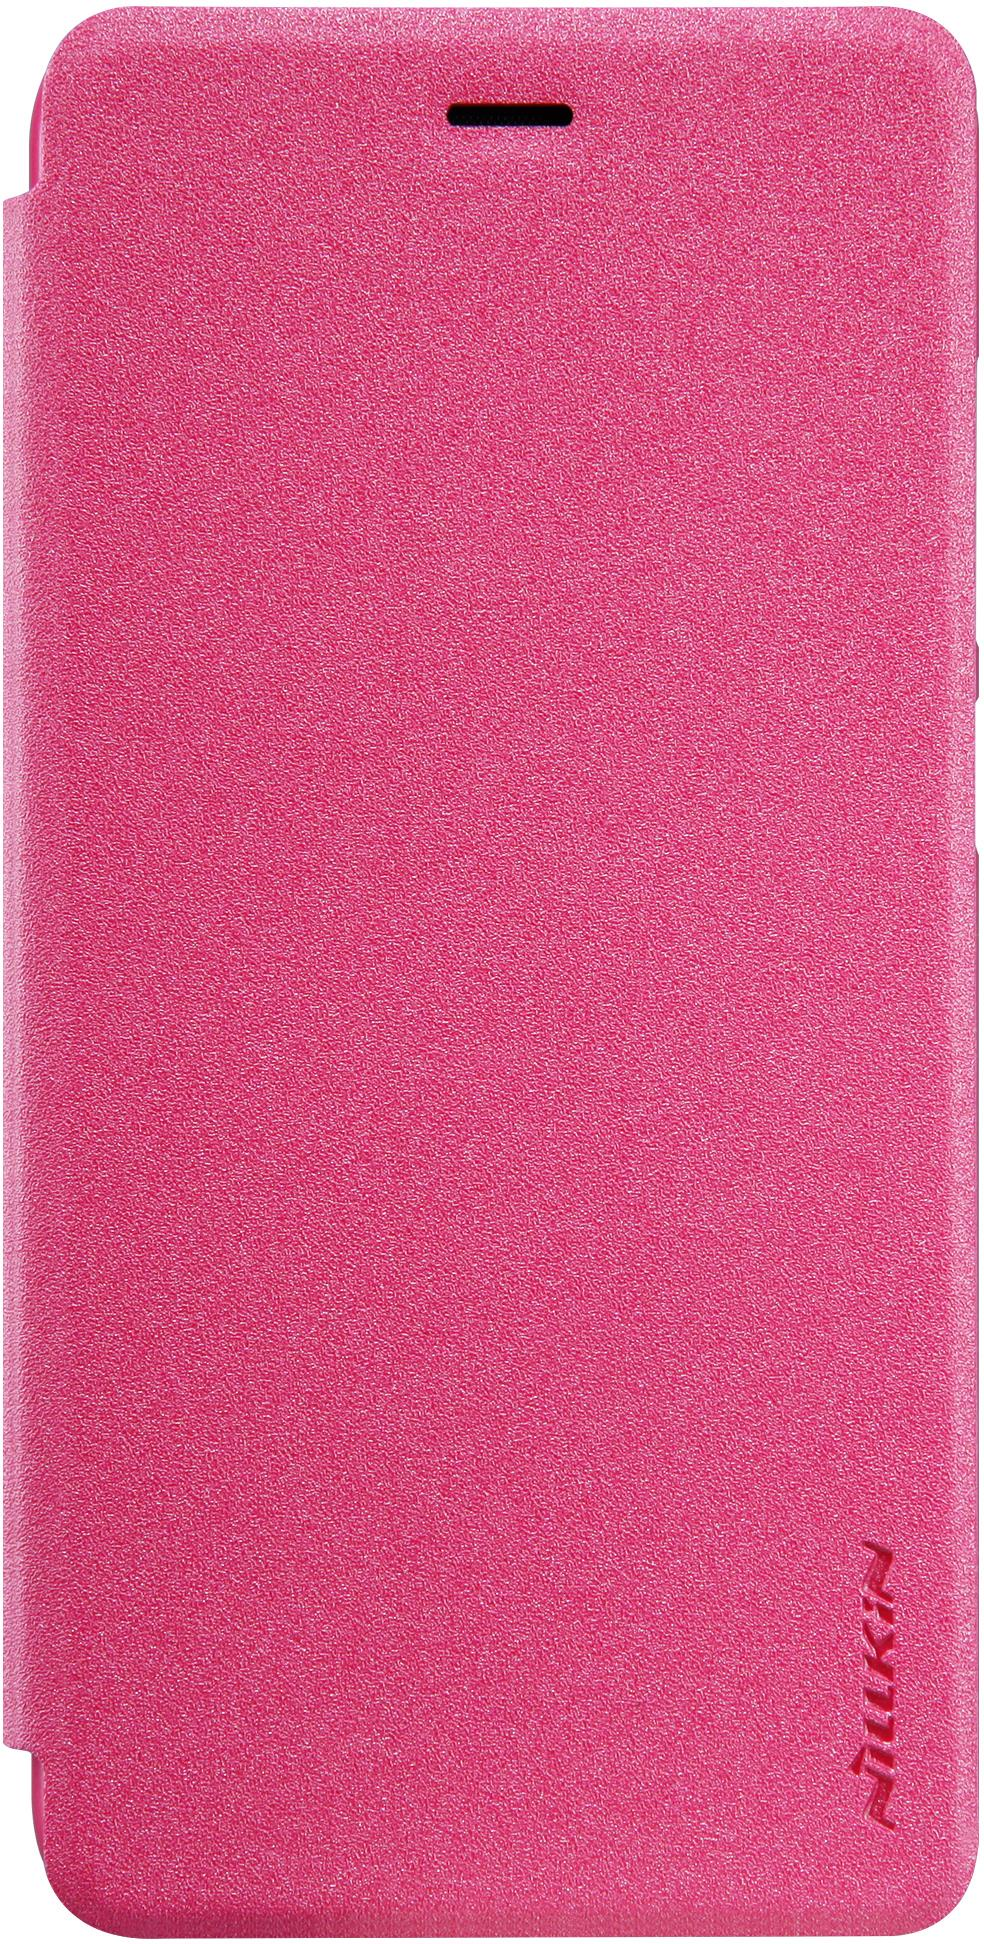 Чехол Nillkin Sparkle для Huawei P10 Lite, 6902048140585, розовый, 12 х 8 х 1 см